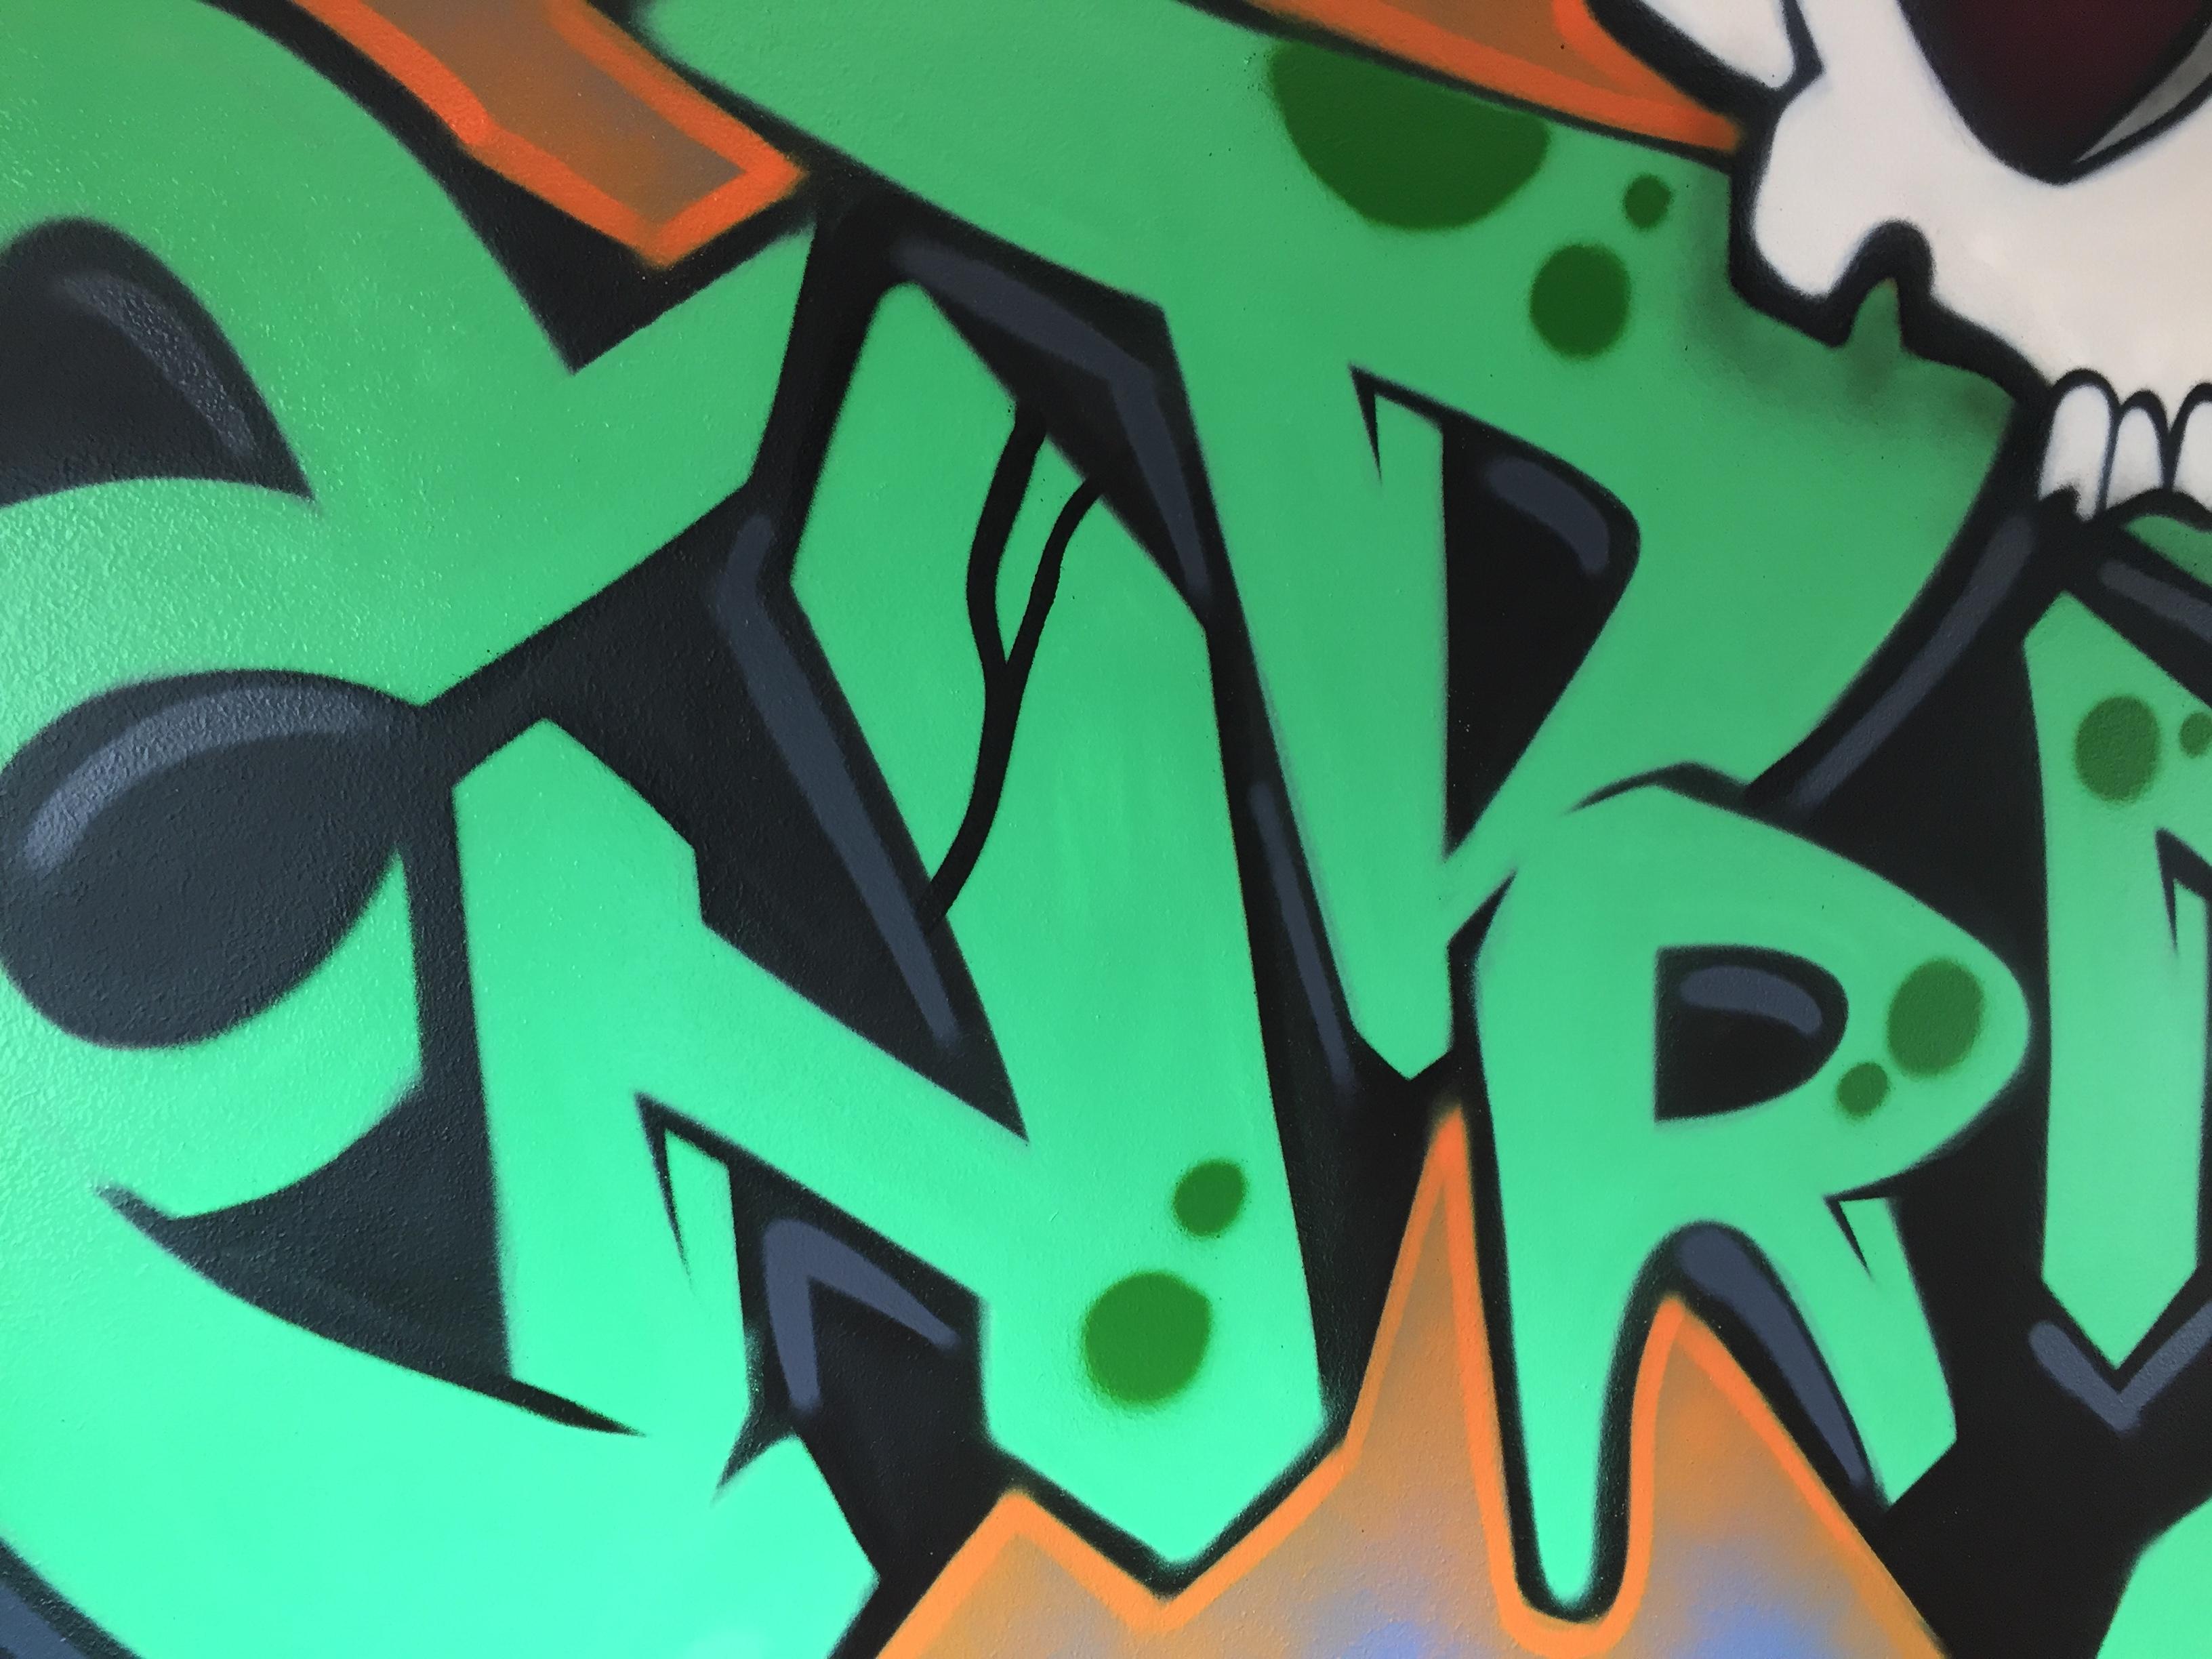 bedroom graffiti close up